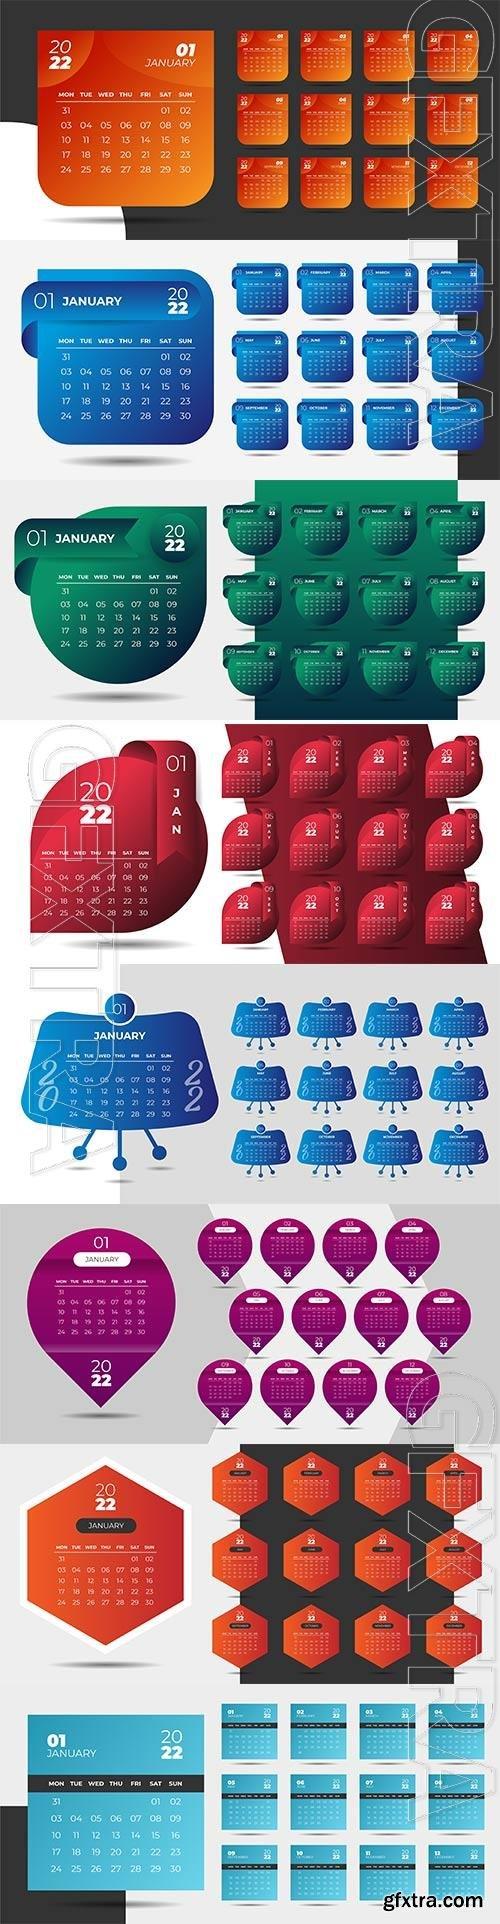 Geometric style professional 2022 calendar design template premium vector